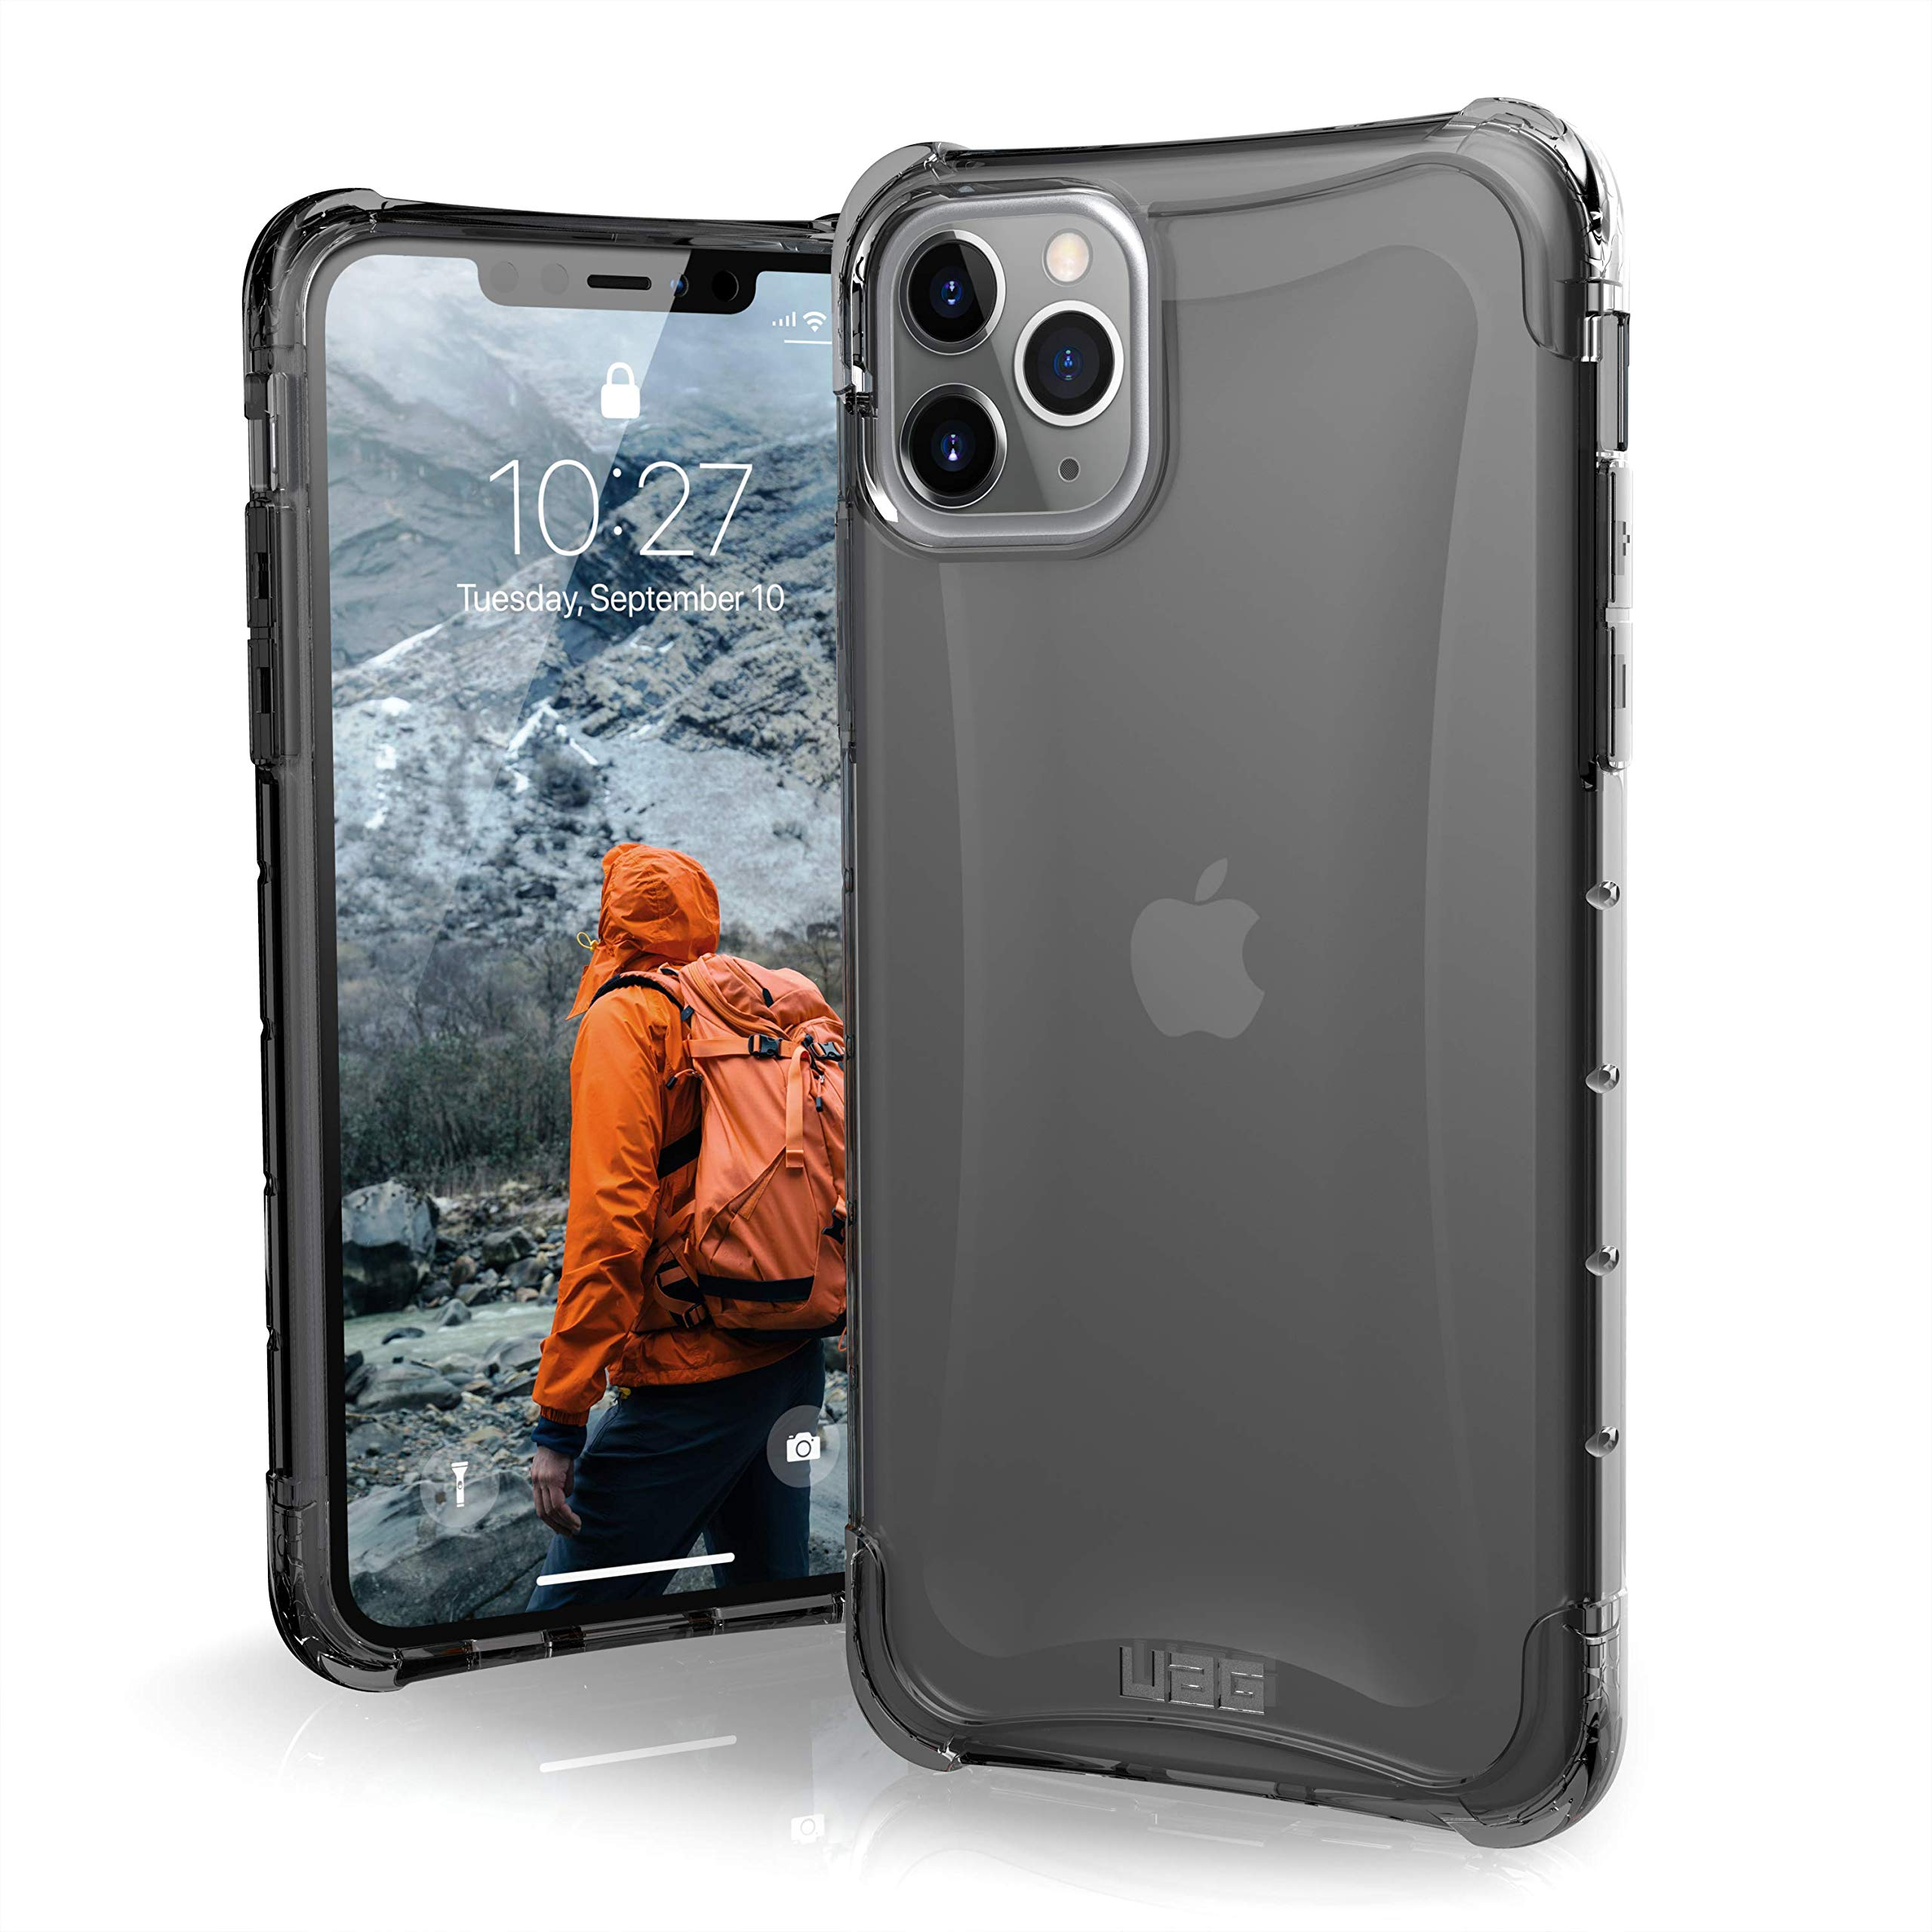 Funda Para iPhone 11 Pro Max (6.5) Uag [7xgmscvs]